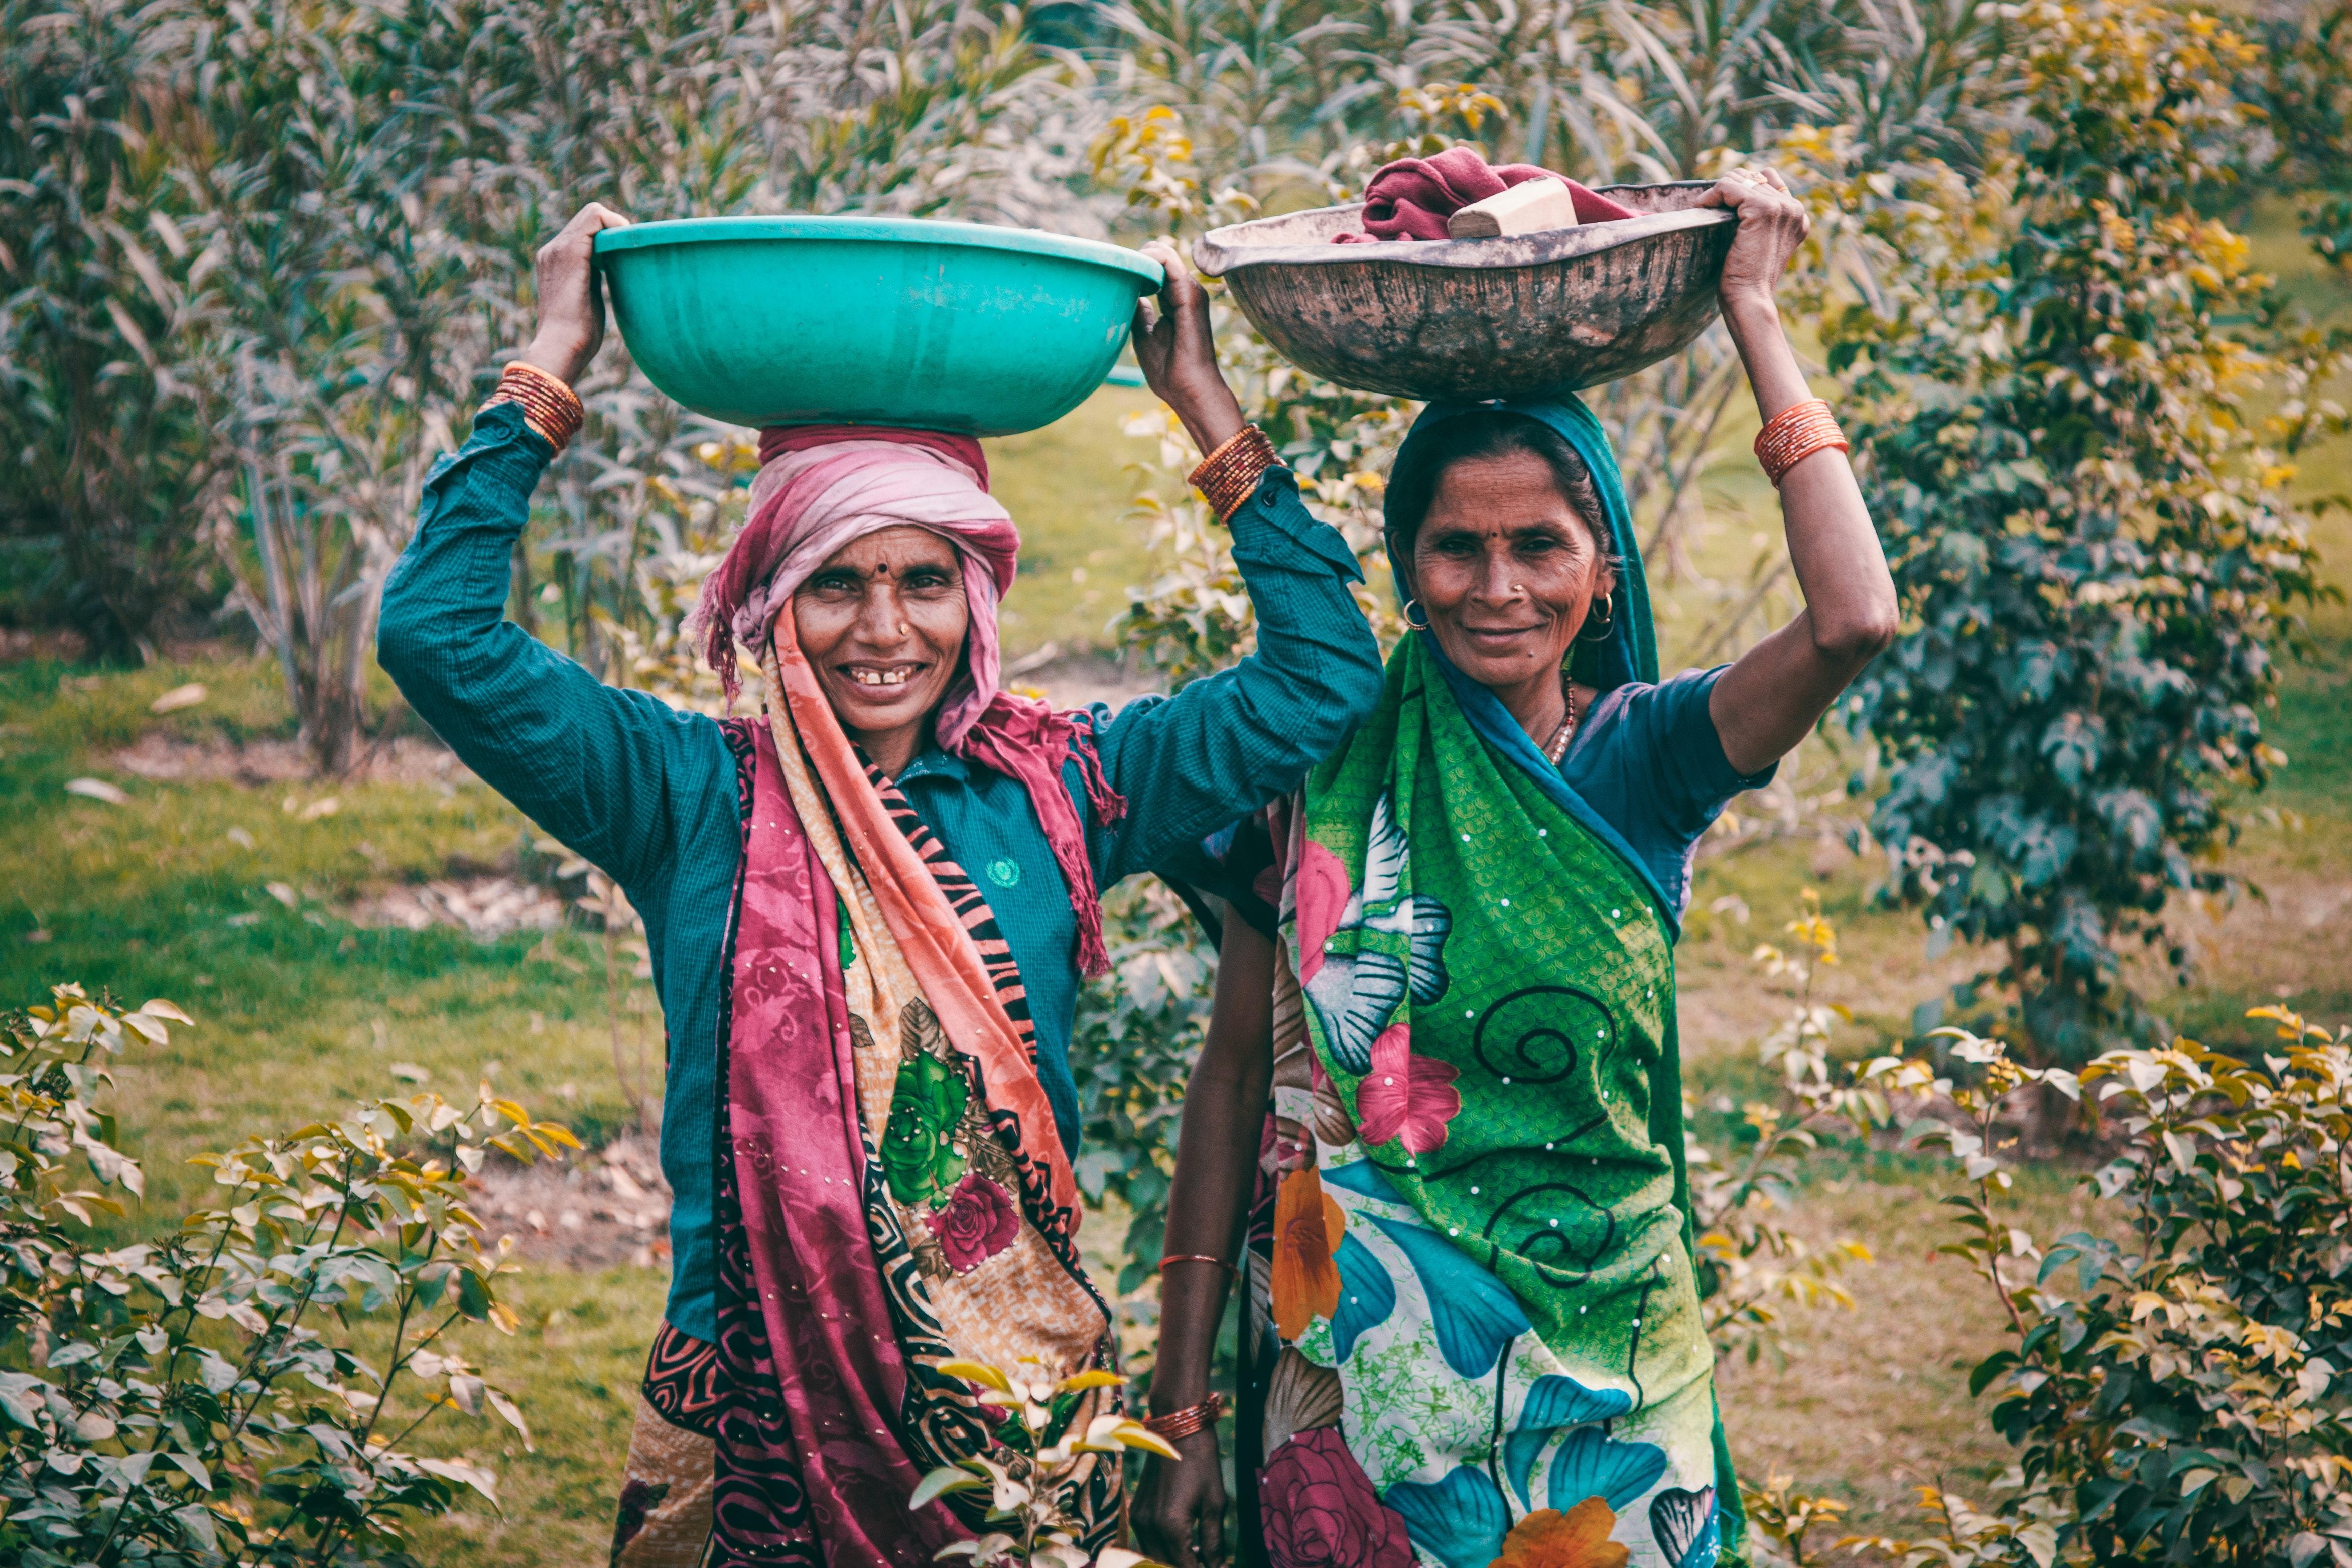 Two women wearing traditional dress carrying basins photo